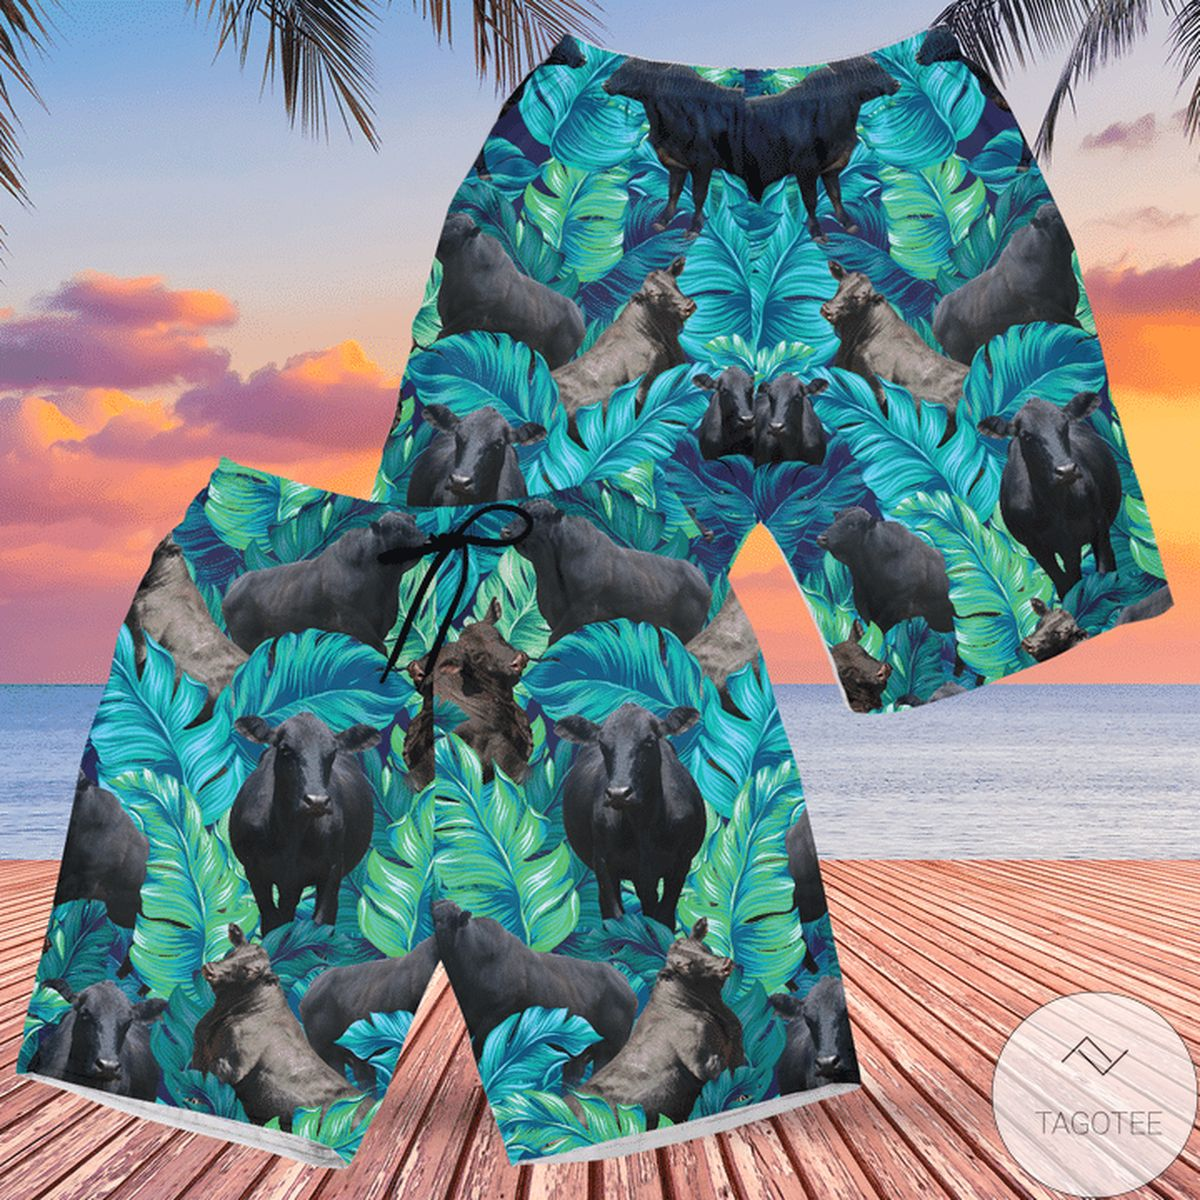 Brangus Cattle Lovers Hawaiian Swim Trunks Beach Shorts